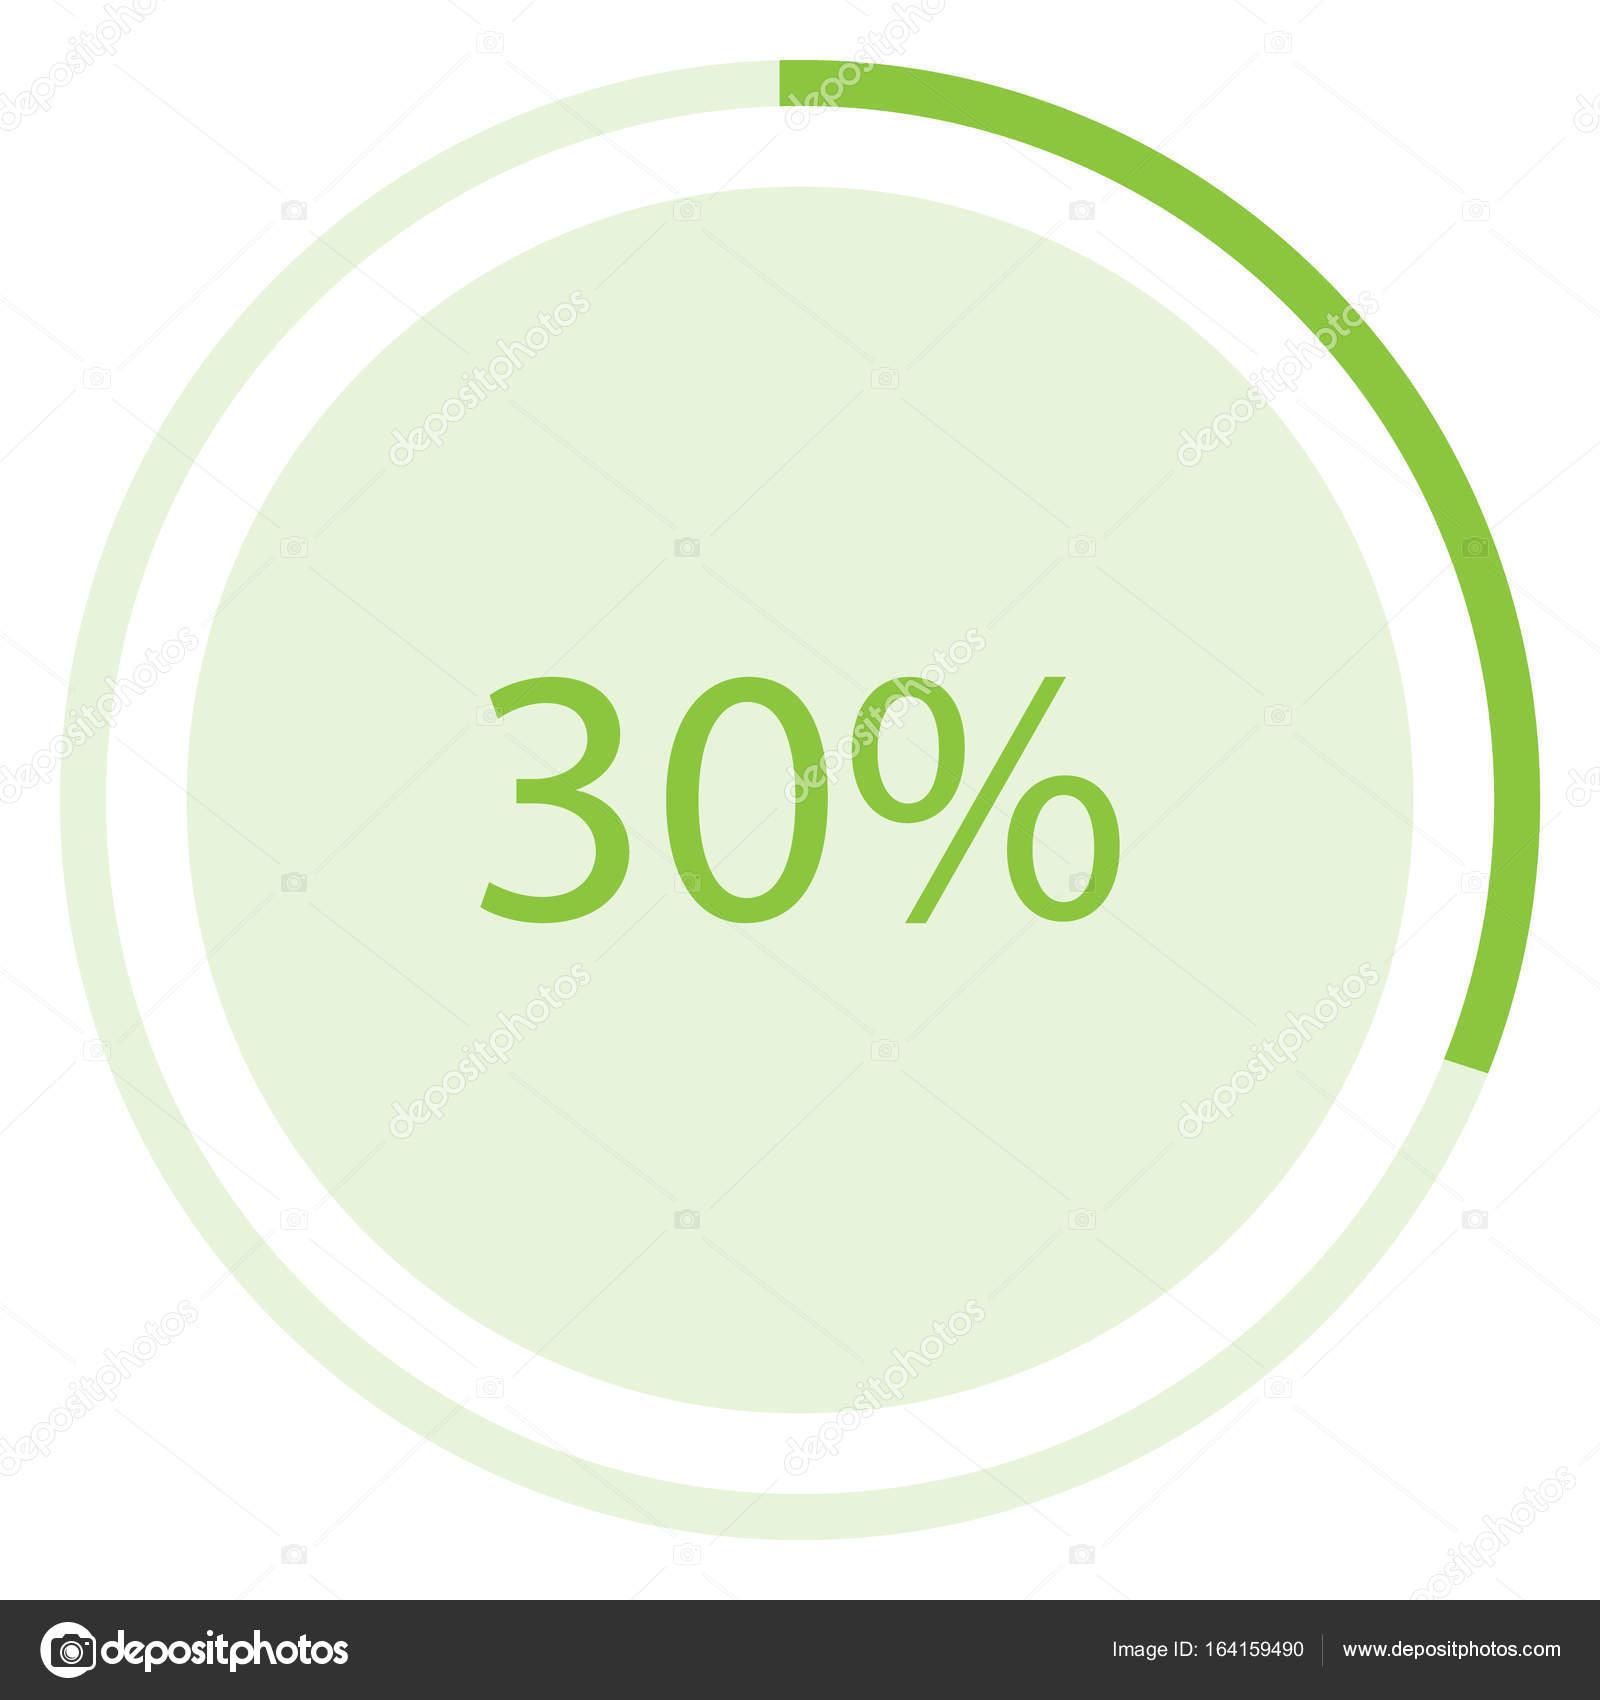 Pie chart raster stock photo viktorijareut 164159490 raster illustration green round circle pie graph chart with percentage 30 icon photo by viktorijareut nvjuhfo Choice Image